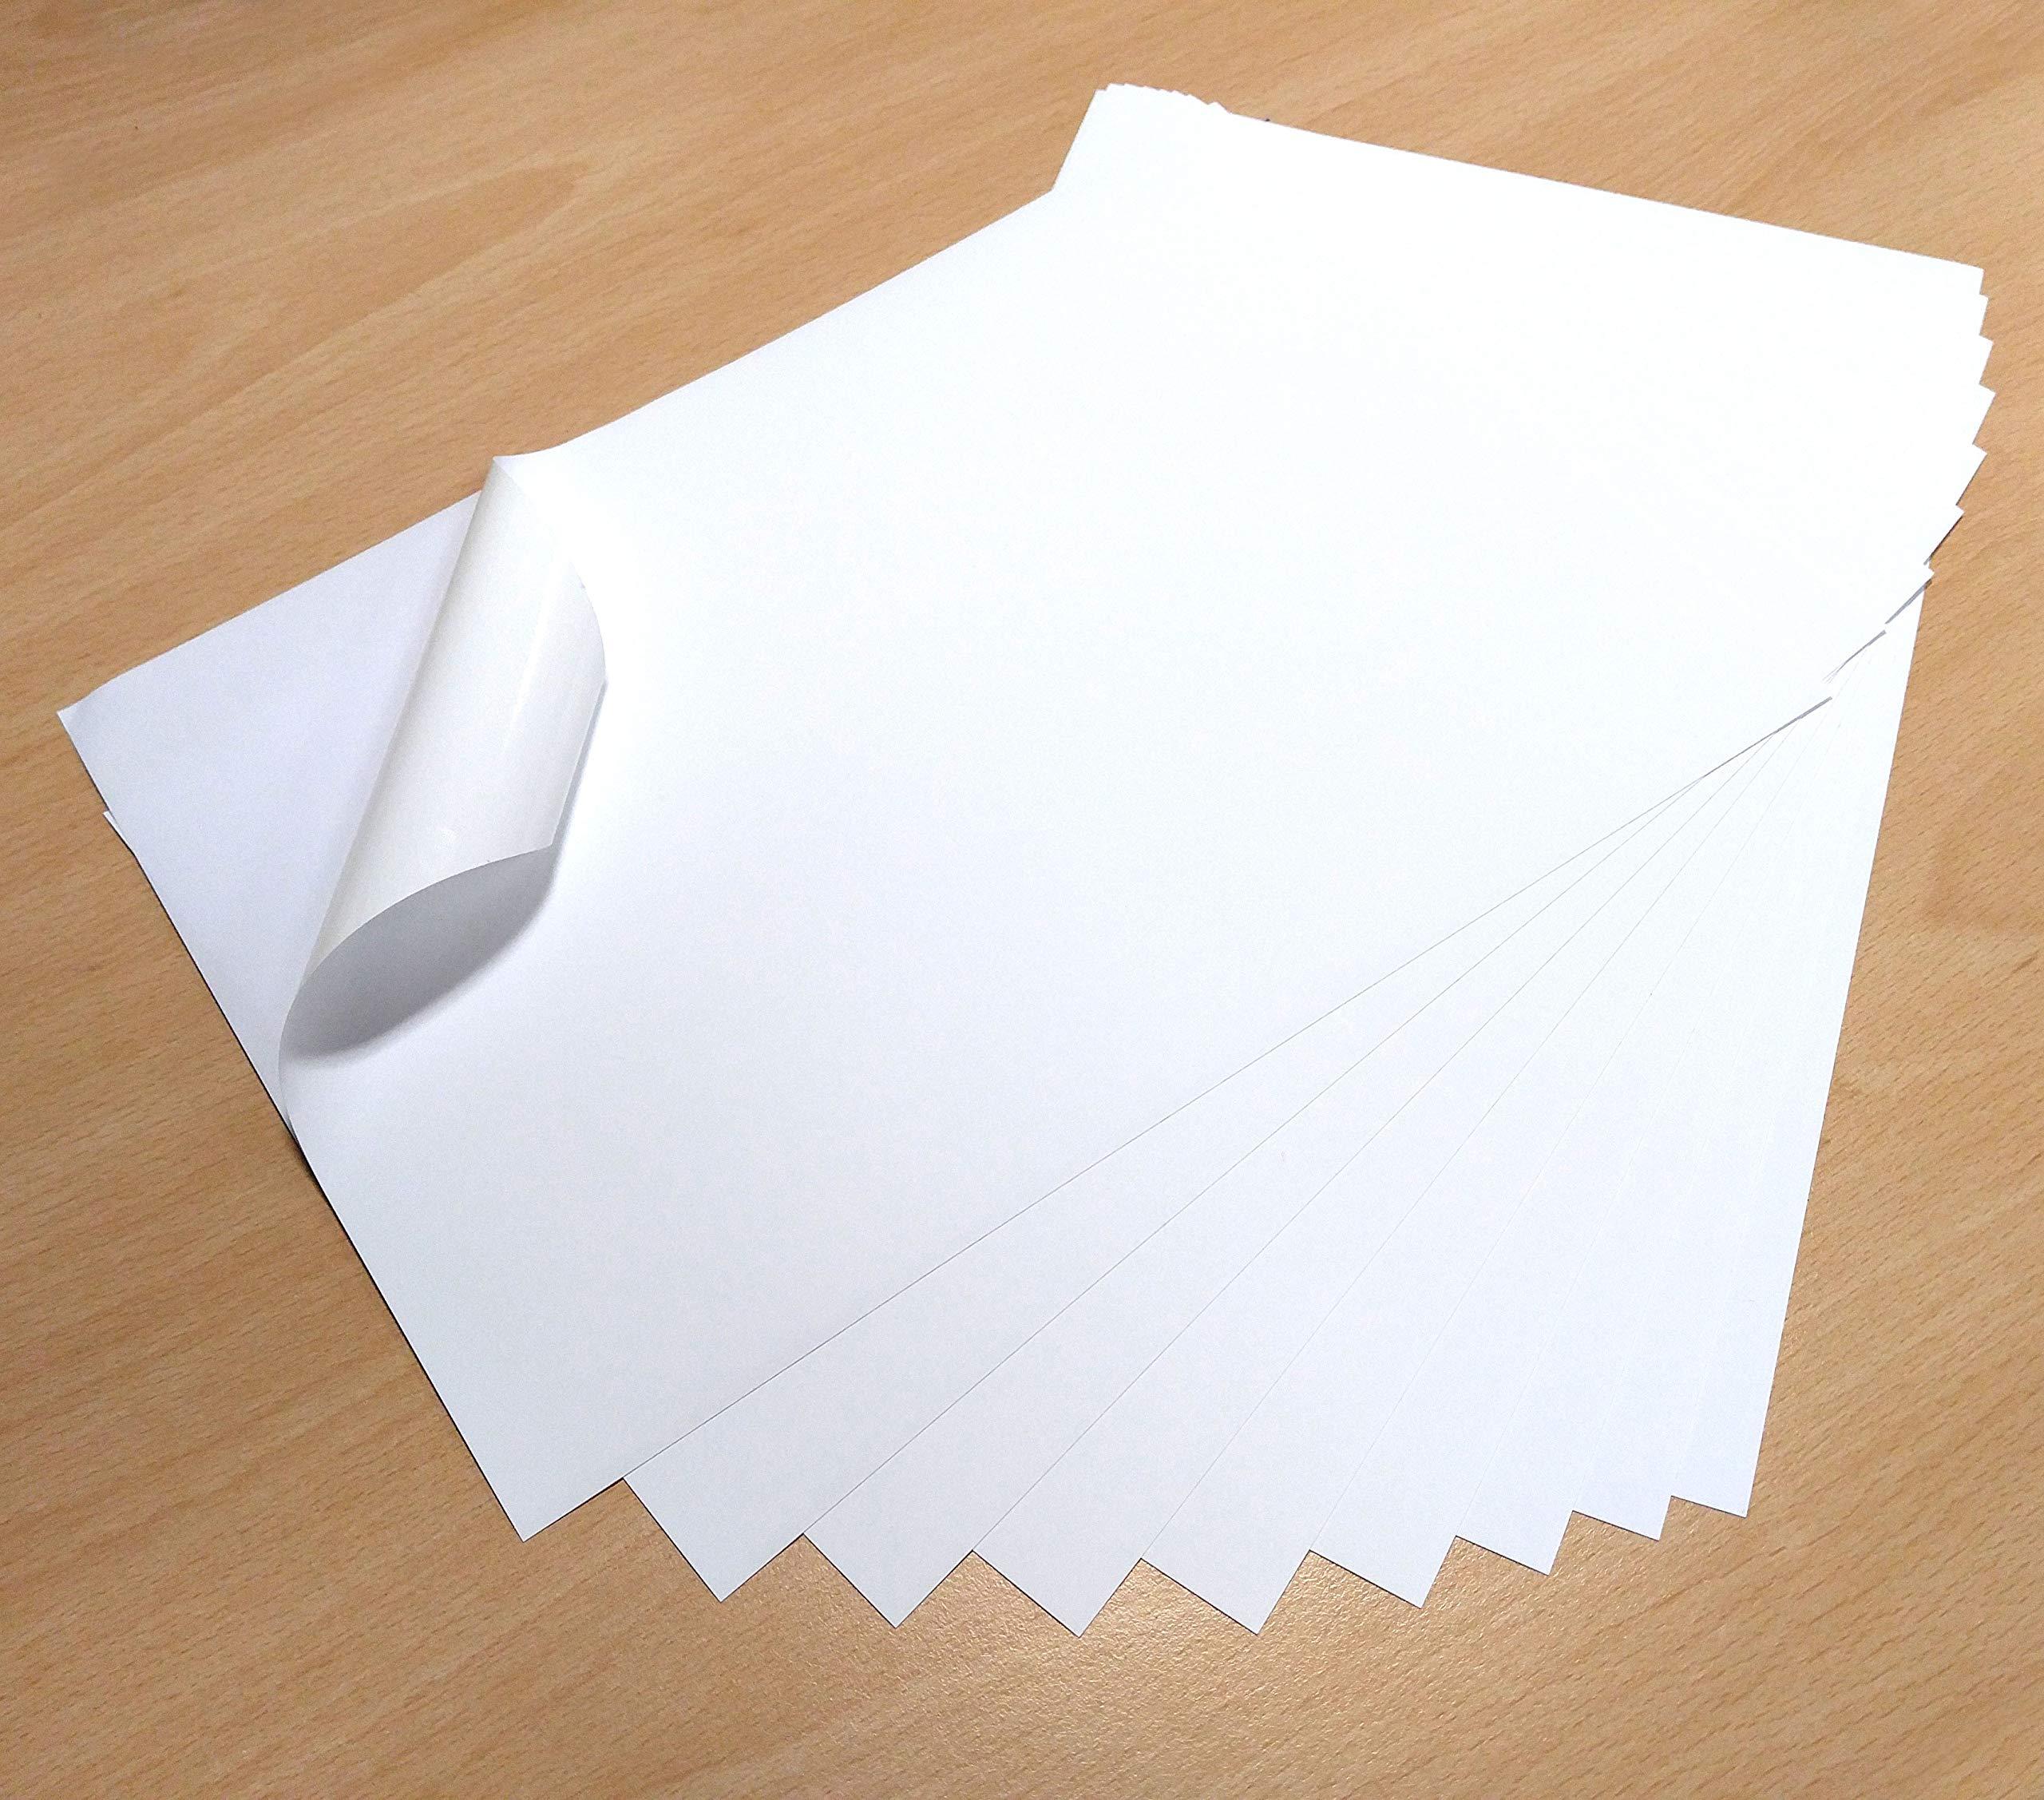 PVC Matte White Self Adhesive Sticker Sheets Quality INKJET LASER Printable 10 Sheets Premium Waterproof A4 VINYL